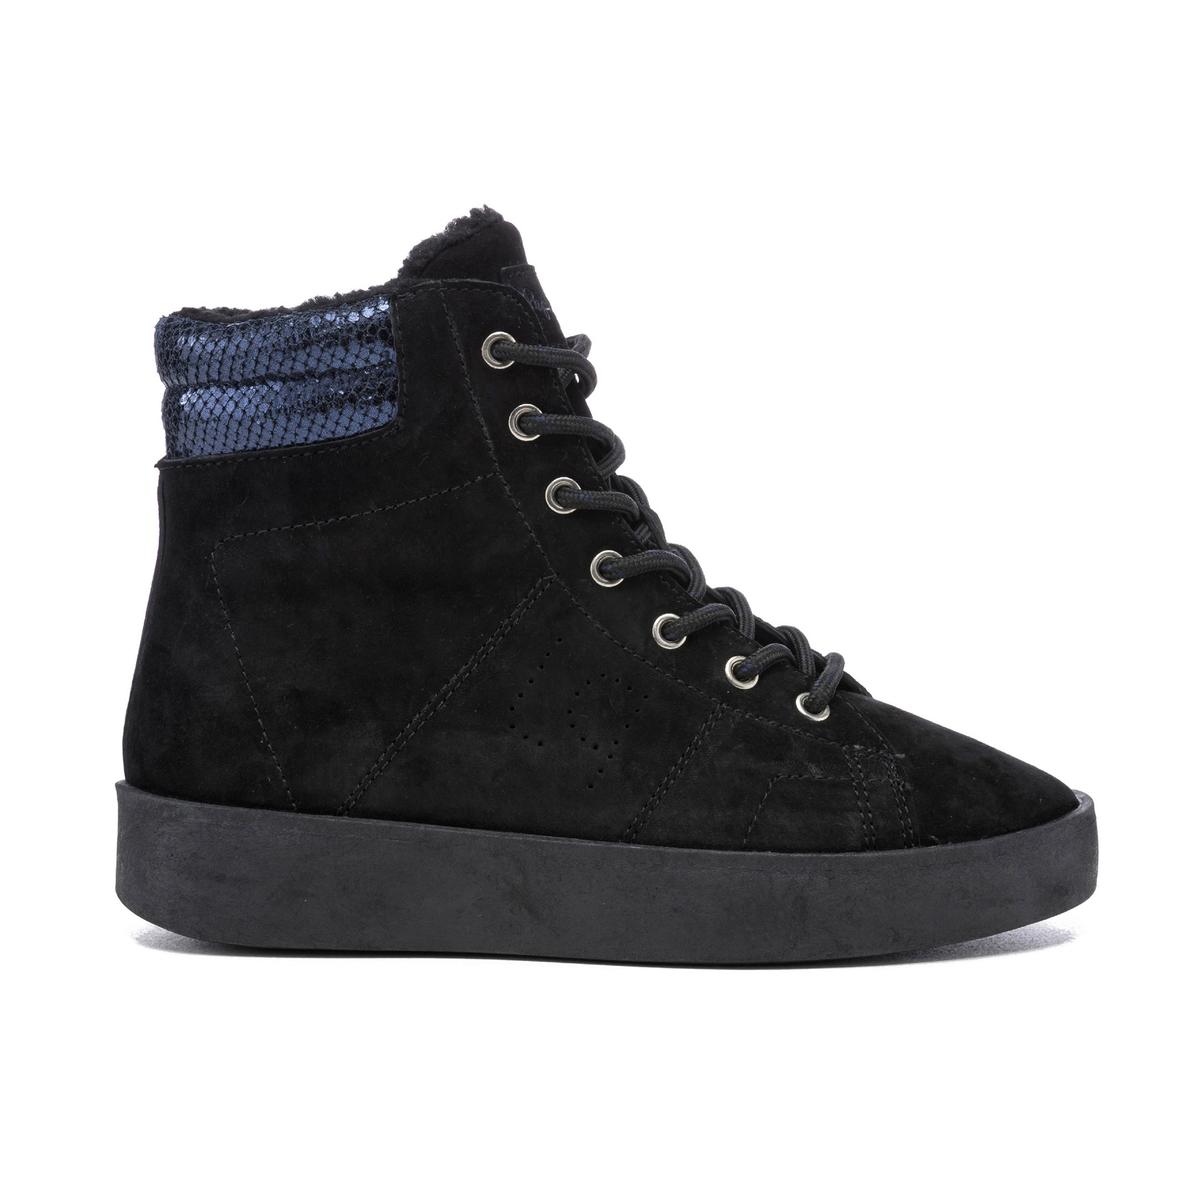 Zapatillas de caña alta Brixton